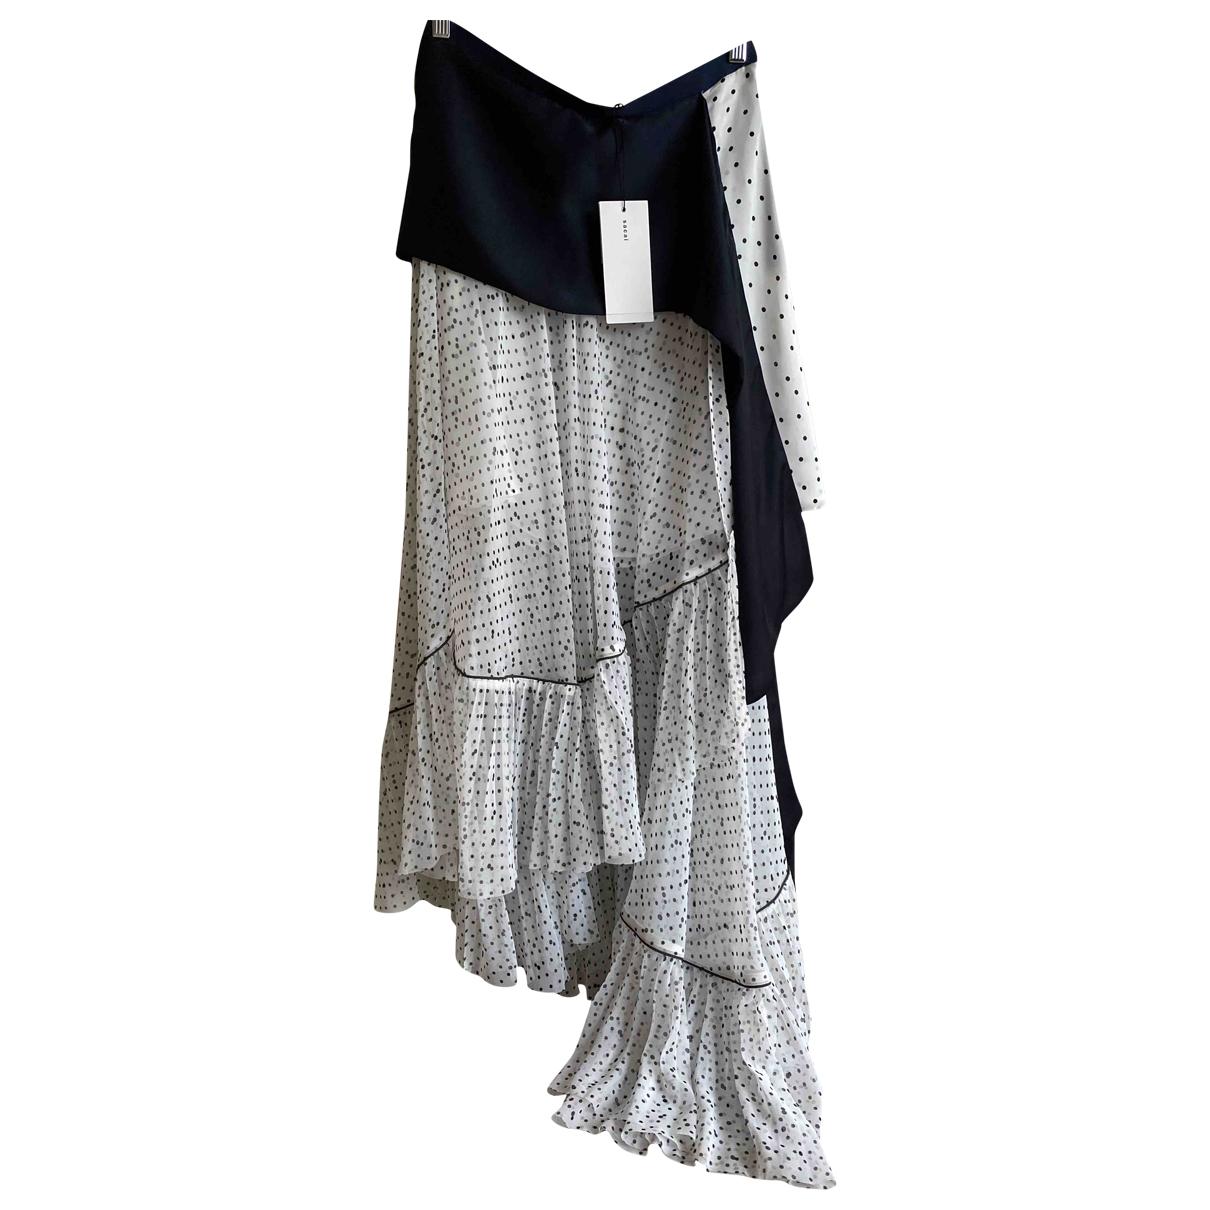 Sacai \N Multicolour skirt for Women 3 0-5